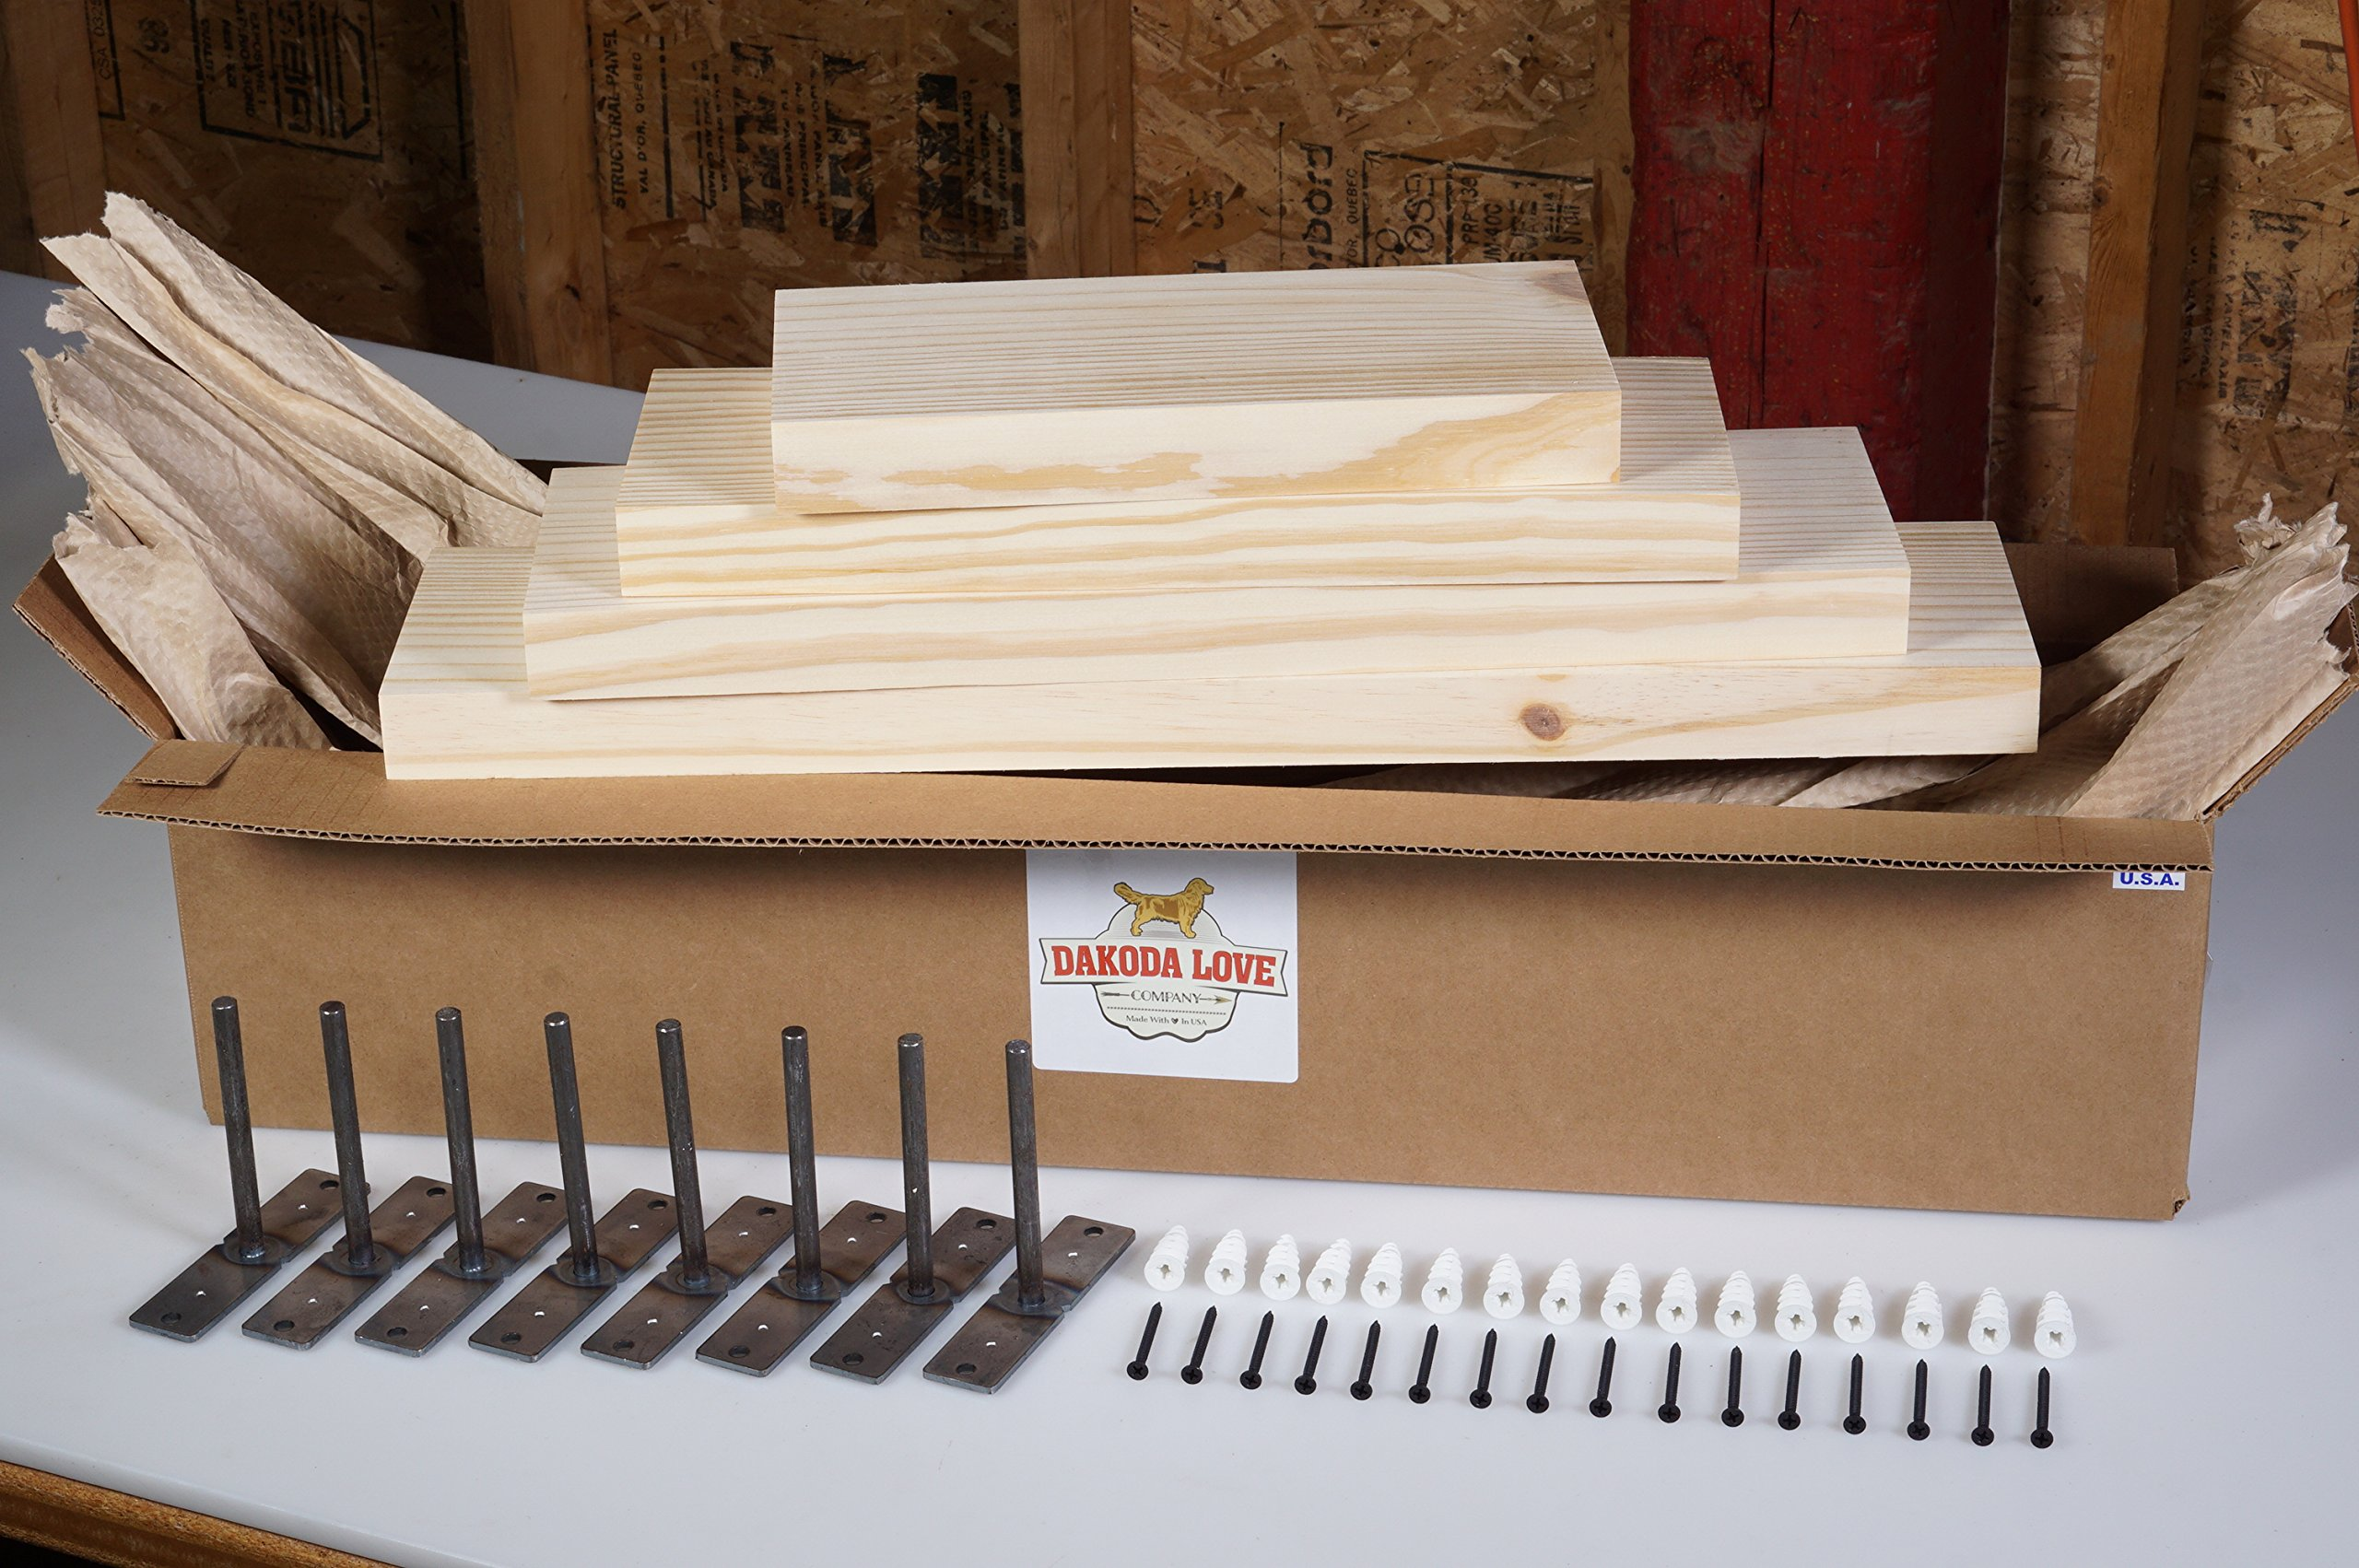 DAKODA LOVE Clean Edge Floating Shelves, USA Handmade, Unfinished Ready to Stain, 100% Countersunk Hidden Floating Shelf Brackets, Beautiful Grain Pine Wood Wall Decor (Set of 4) (Unfinished) by DAKODA LOVE (Image #2)